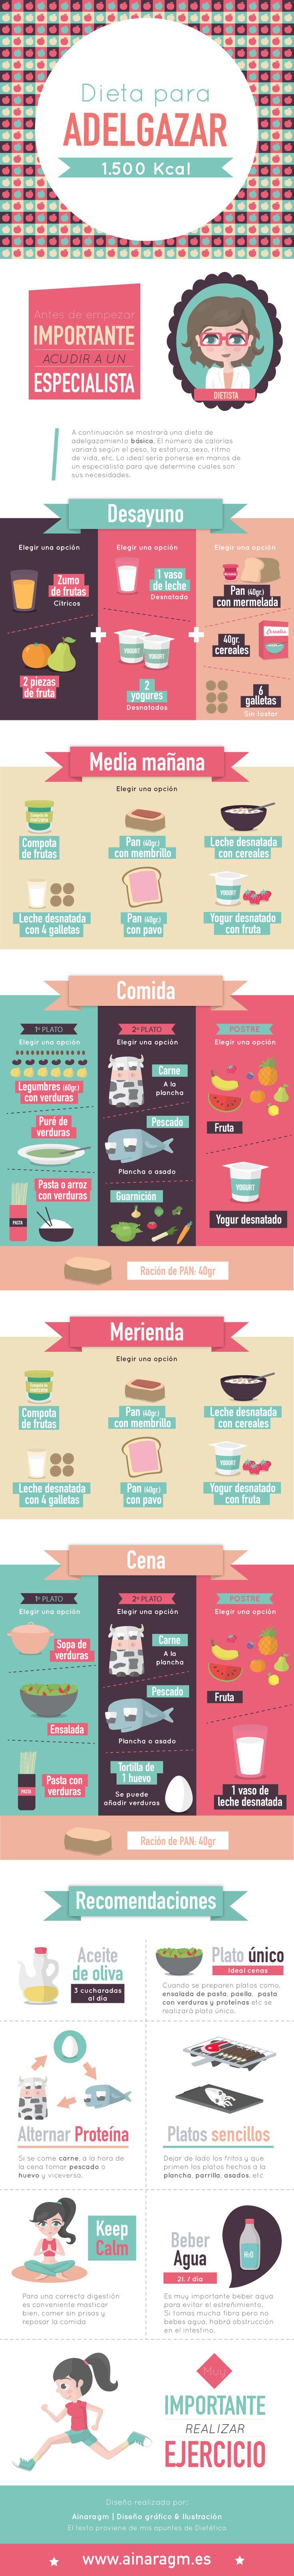 Infografía sobre una dieta de adelgazamiento #dietetica #alimentacion #salud #infografia #diseno #ilustracion